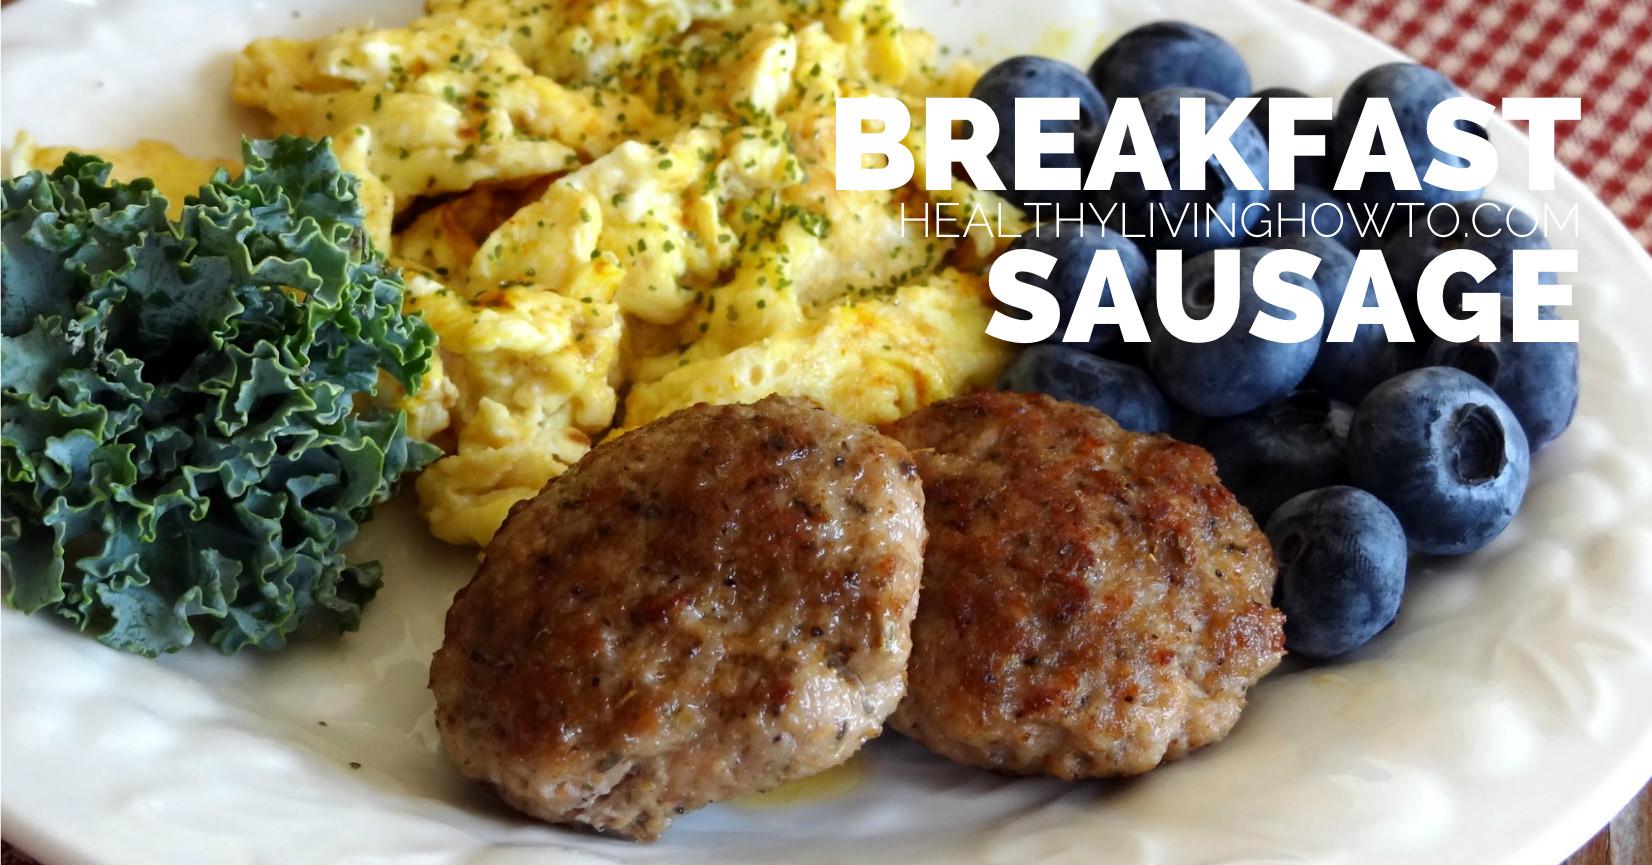 Healthy Breakfast Sausage  Breakfast Sausage Recipe Healthy Living How To